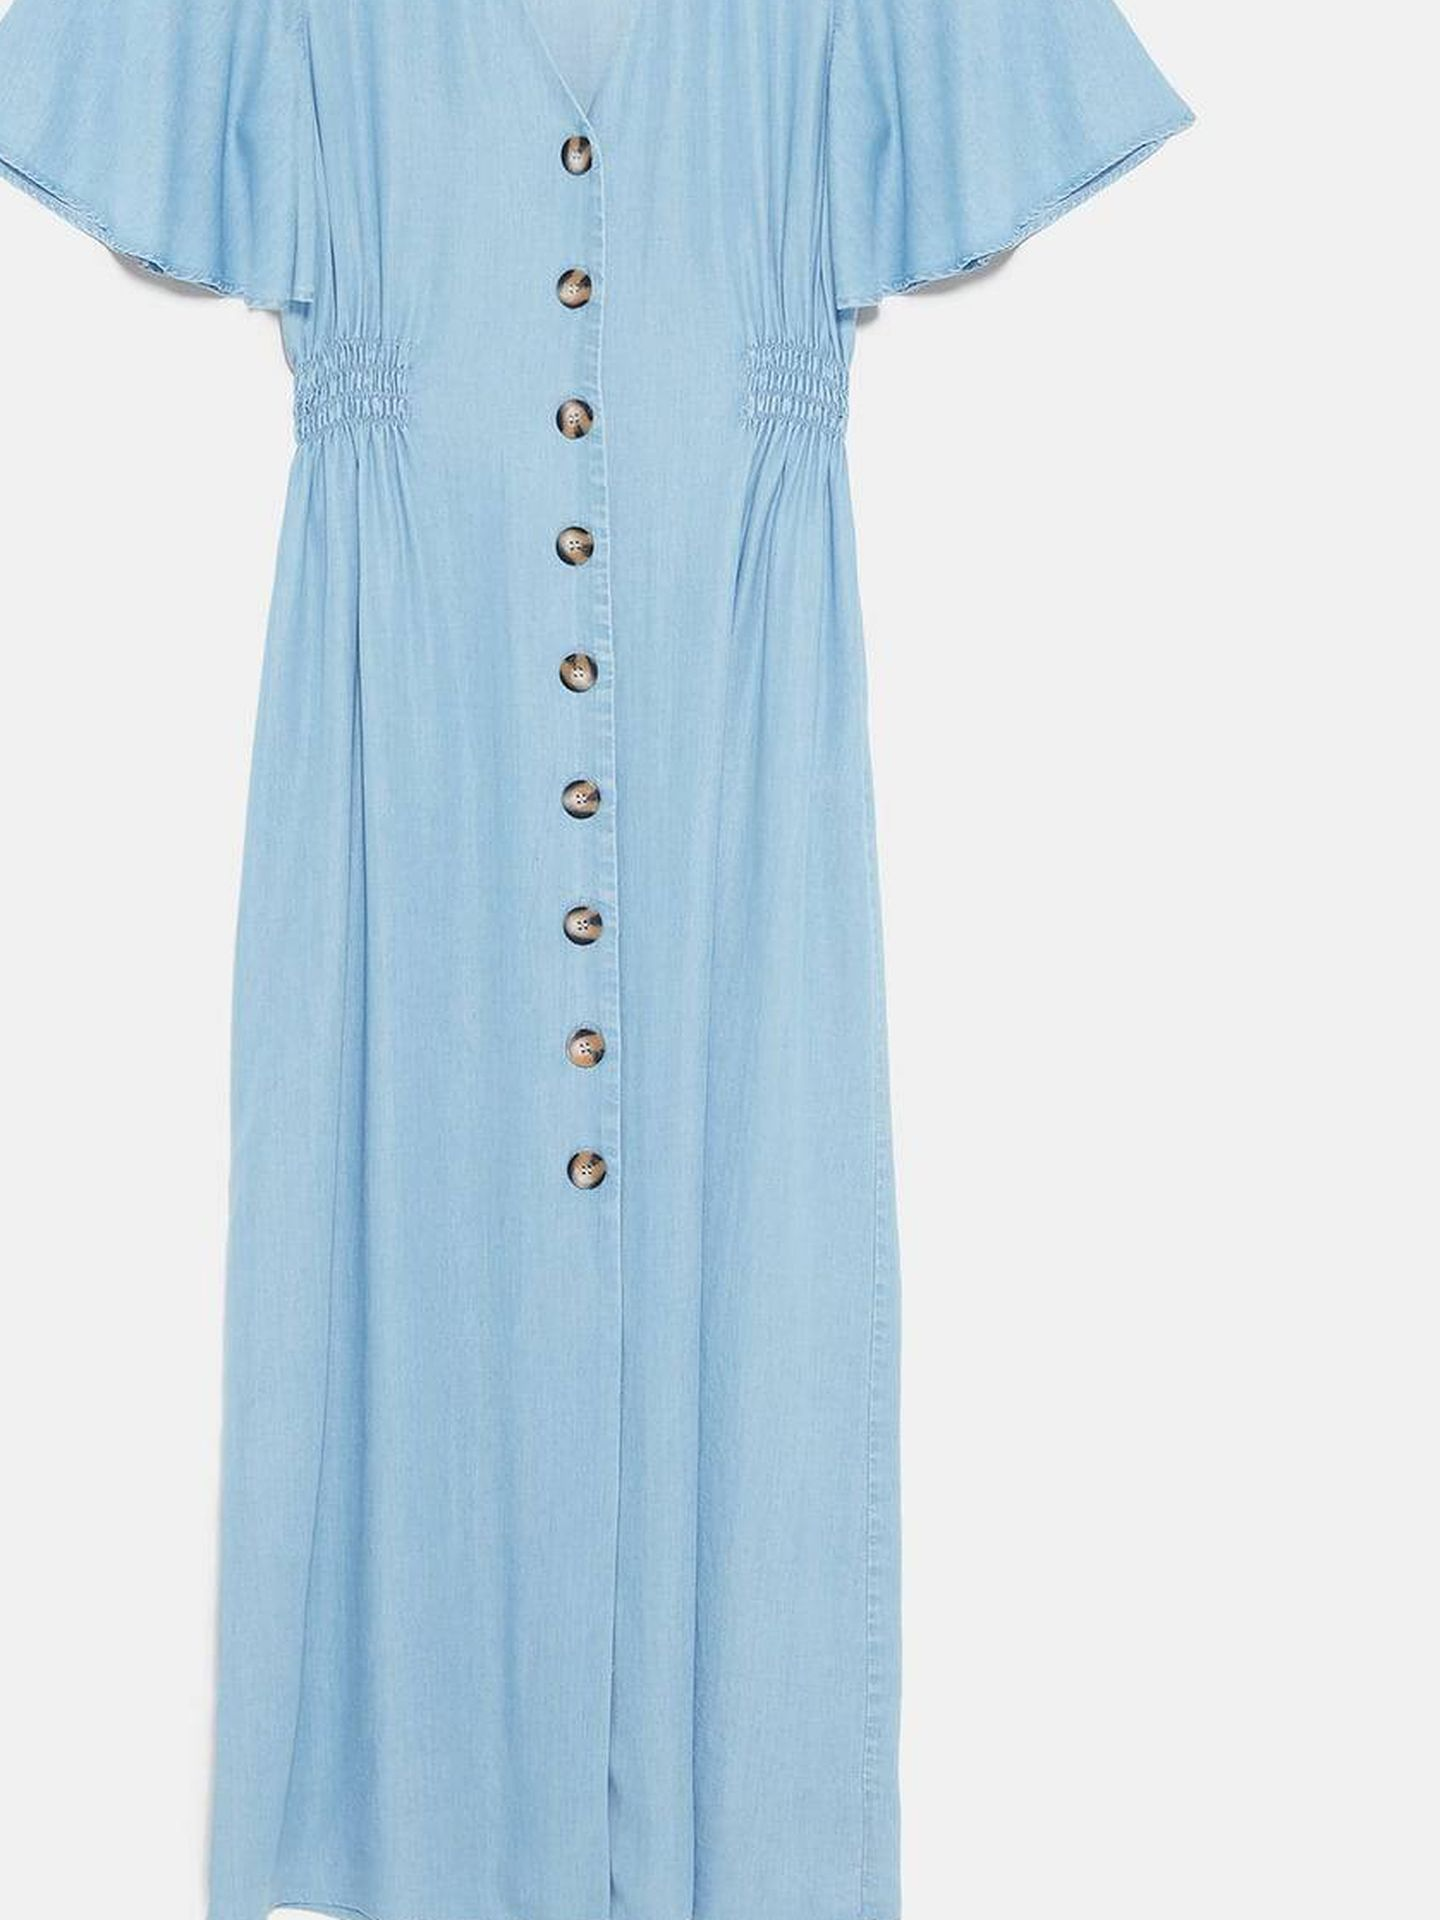 Silueta del vestido de Zara.